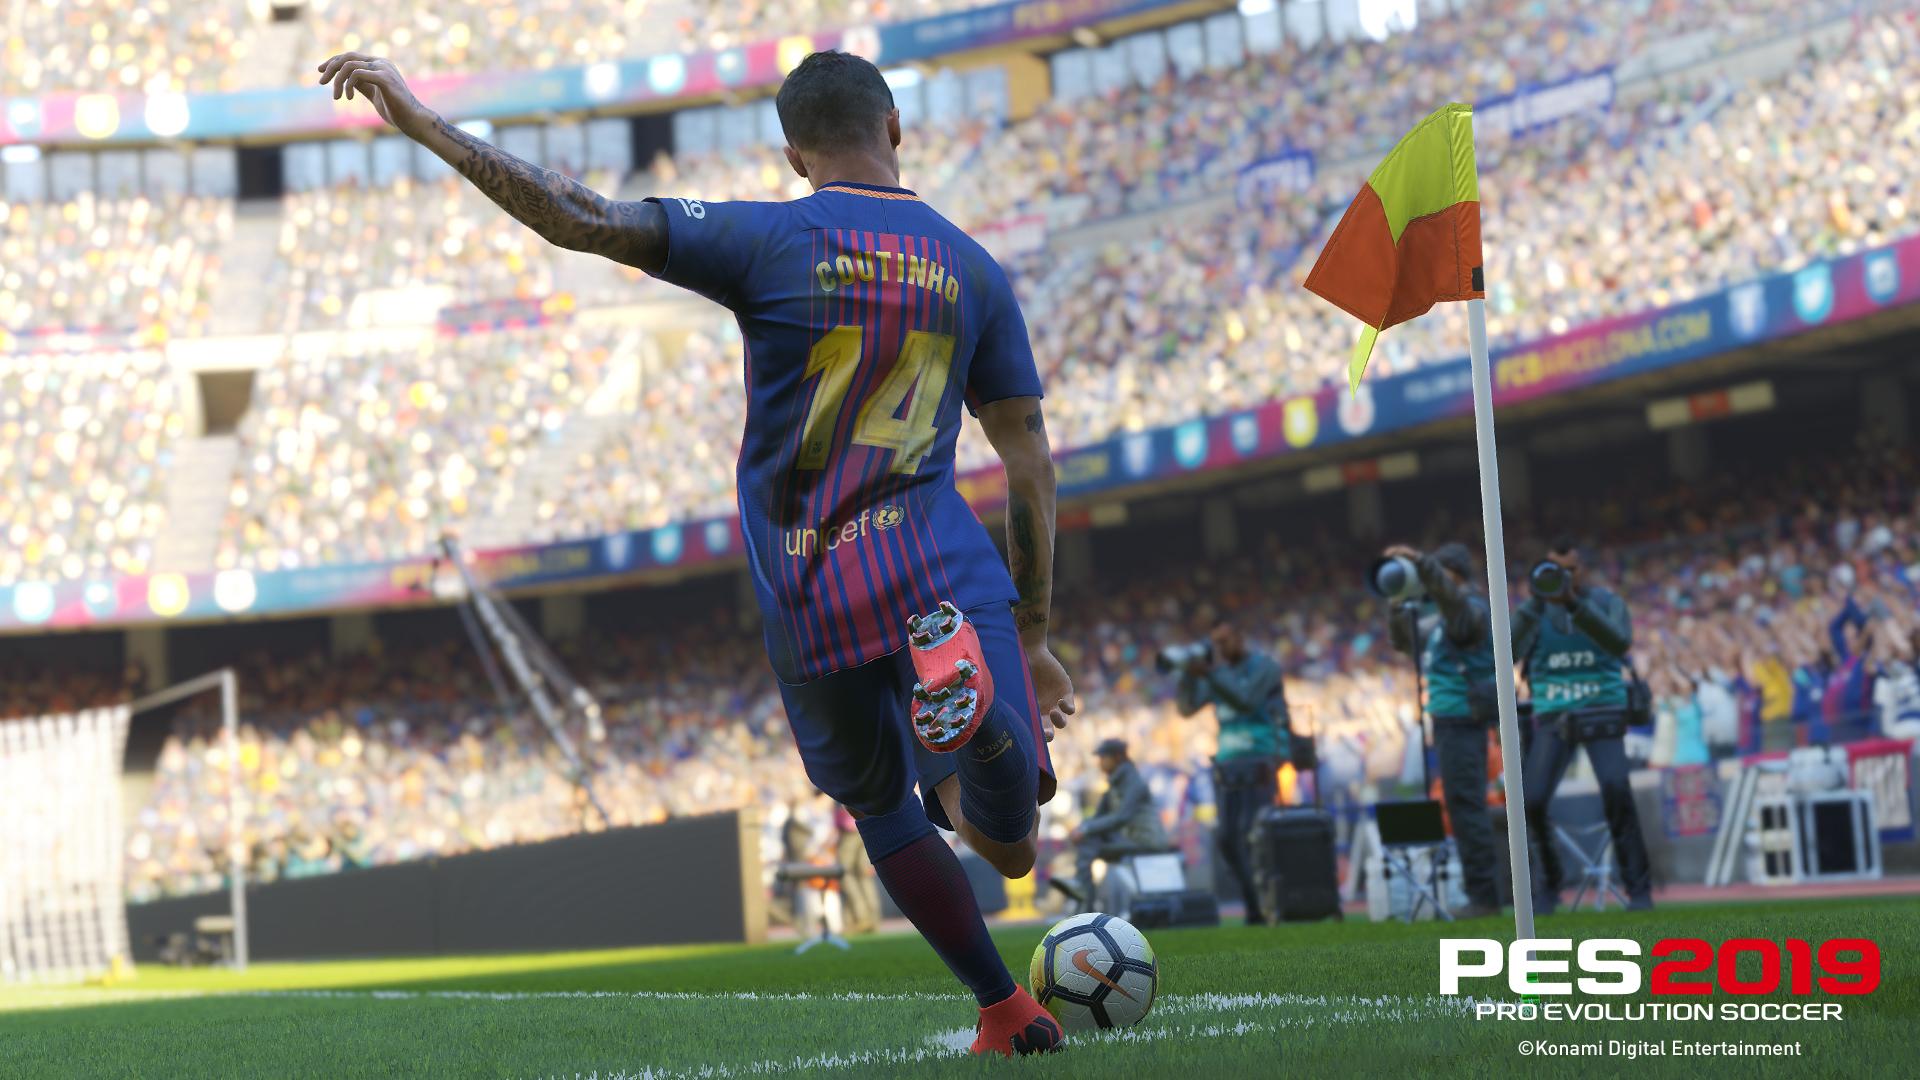 PES 2019 im Test  Pro Evolution Soccer 2019 Review auf PS4 und Xbox 6c1270e134577